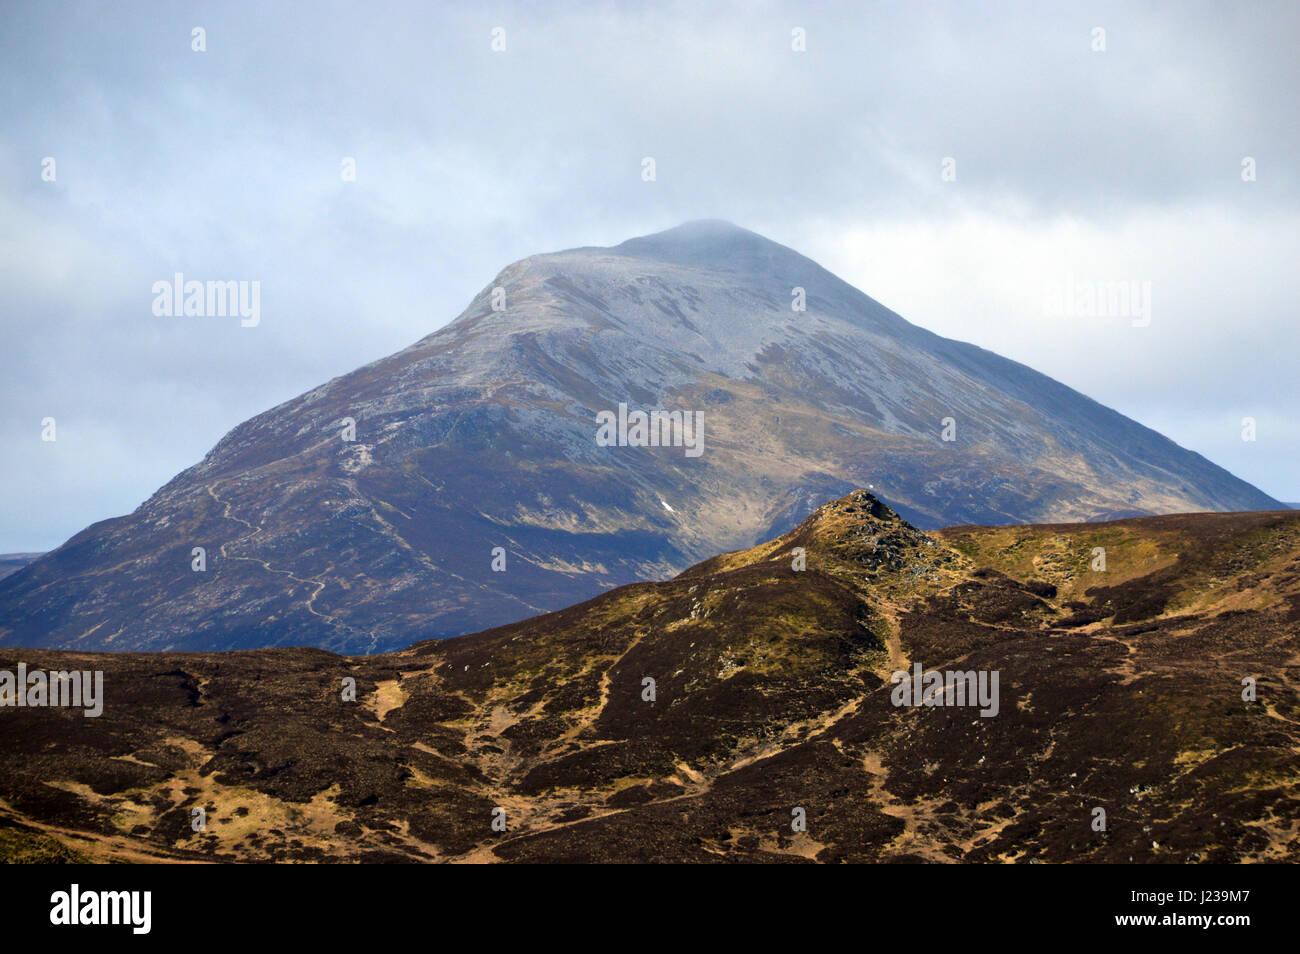 The Scottish Mountain Munro Schiehallion from Summit of the Corbett Farragon Hill near Aberfeldy,Tay Forest Park, - Stock Image